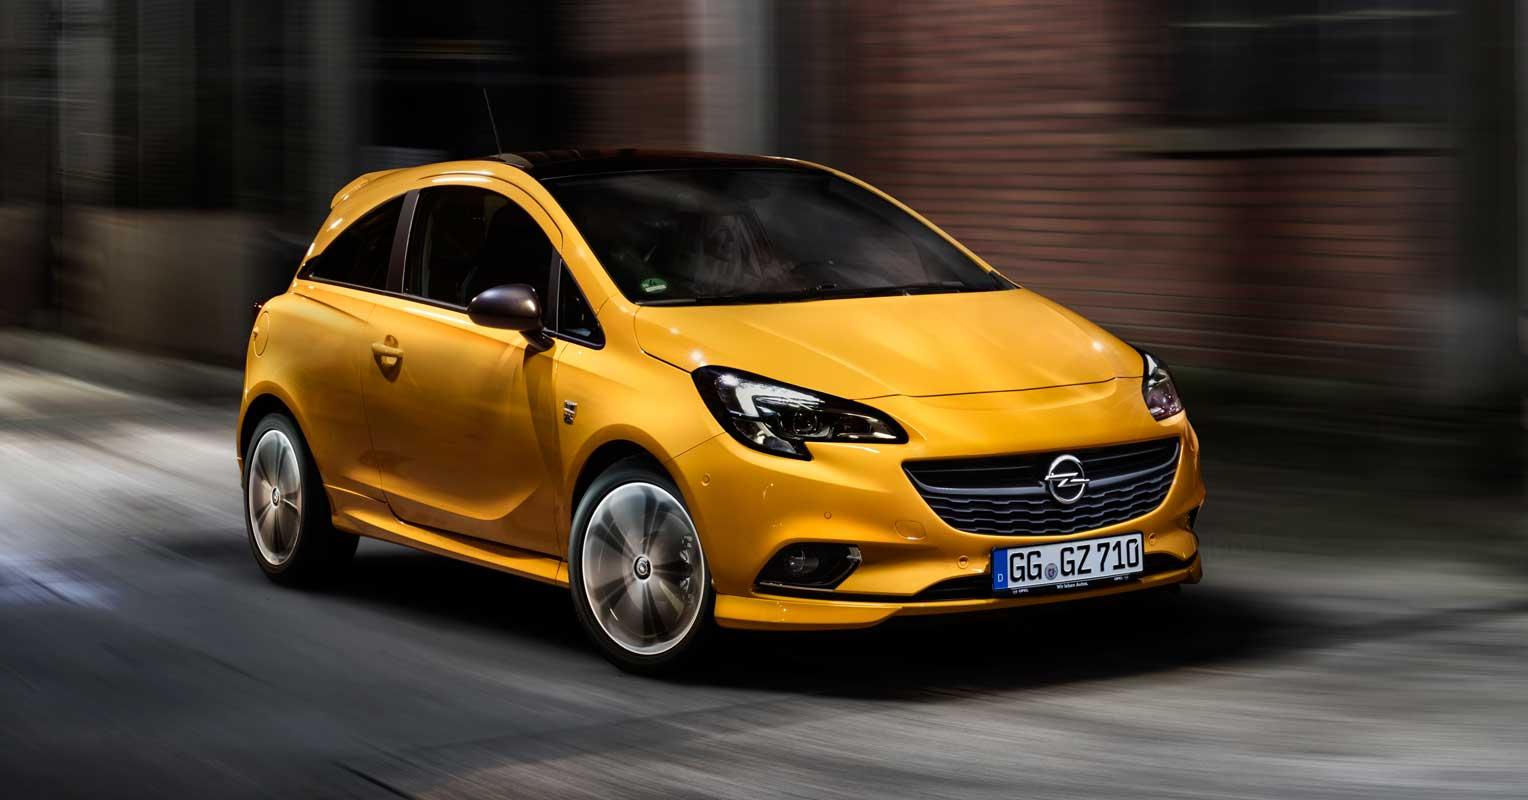 Opel Corsa amarillo